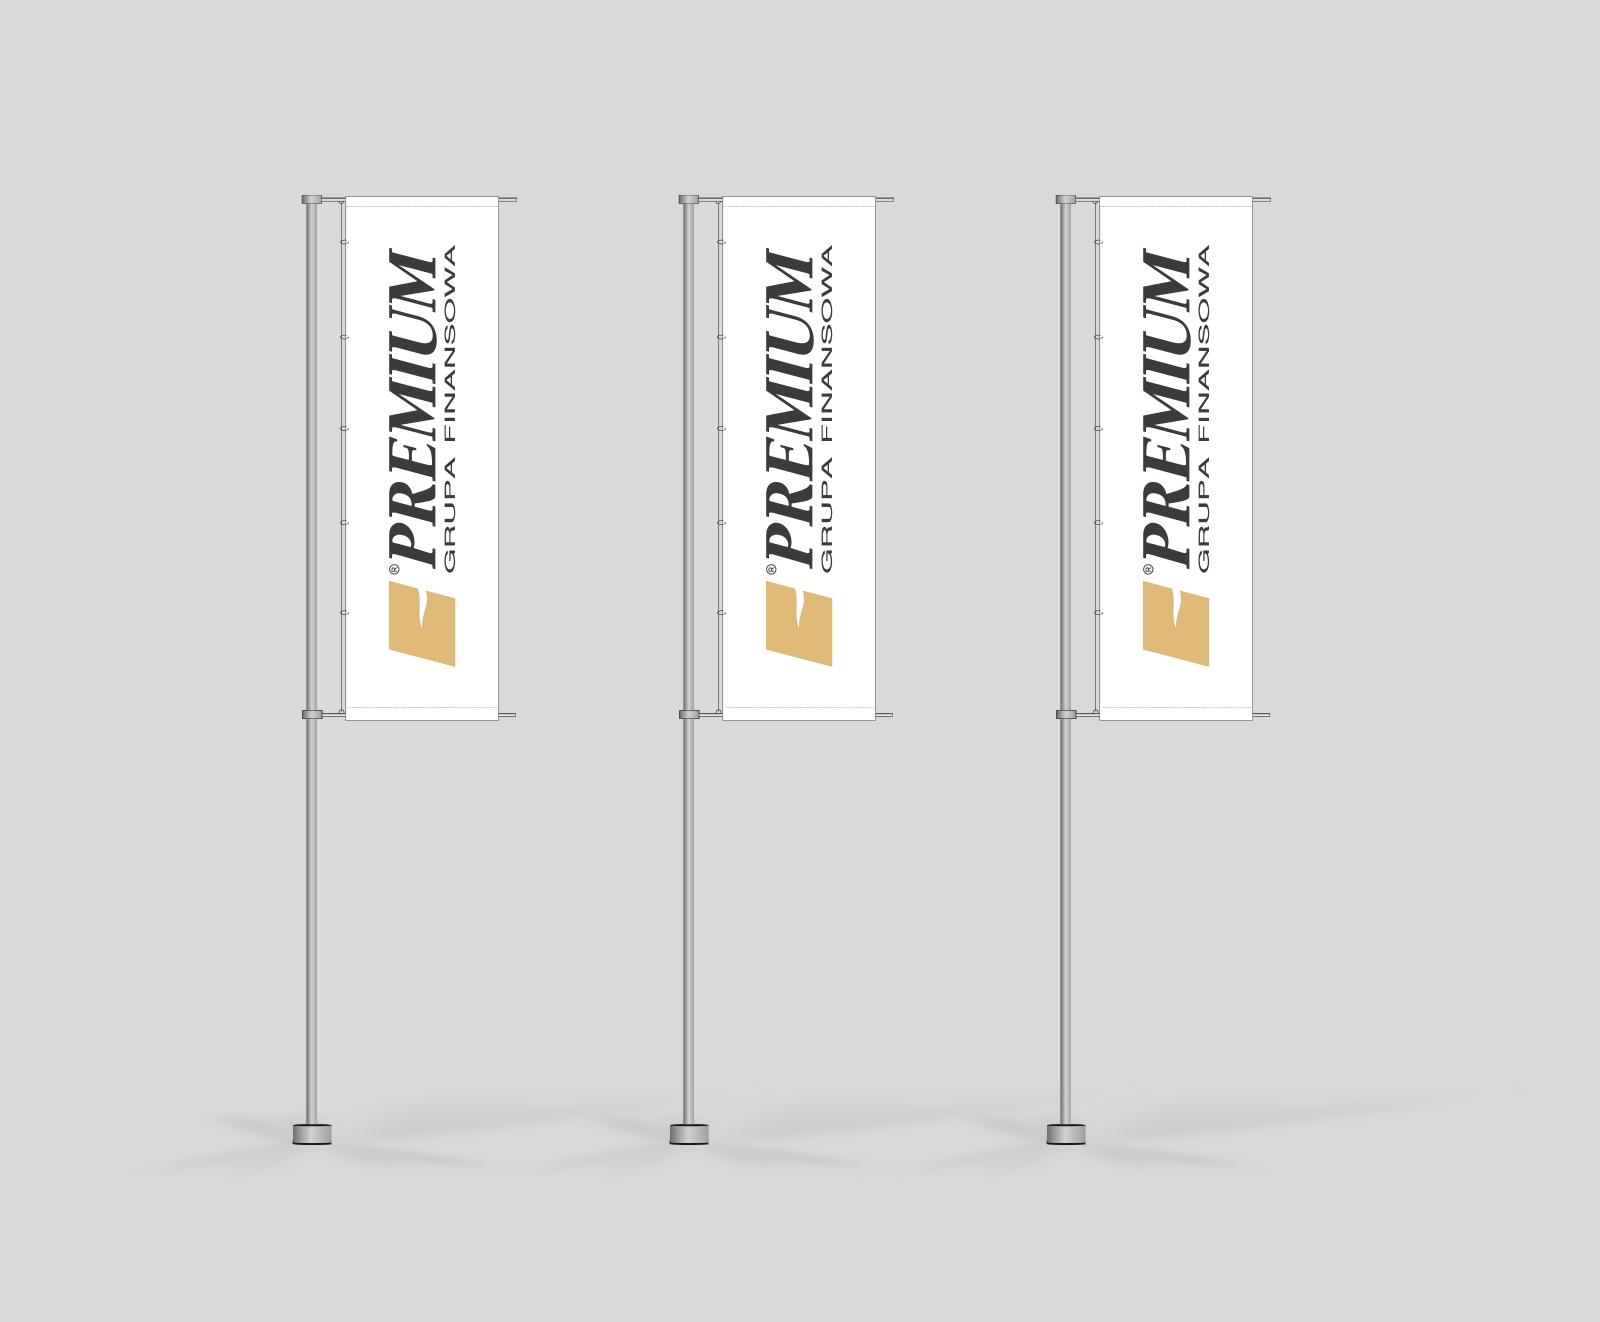 Grupa Finansowa Premium SA flagi reklamowe